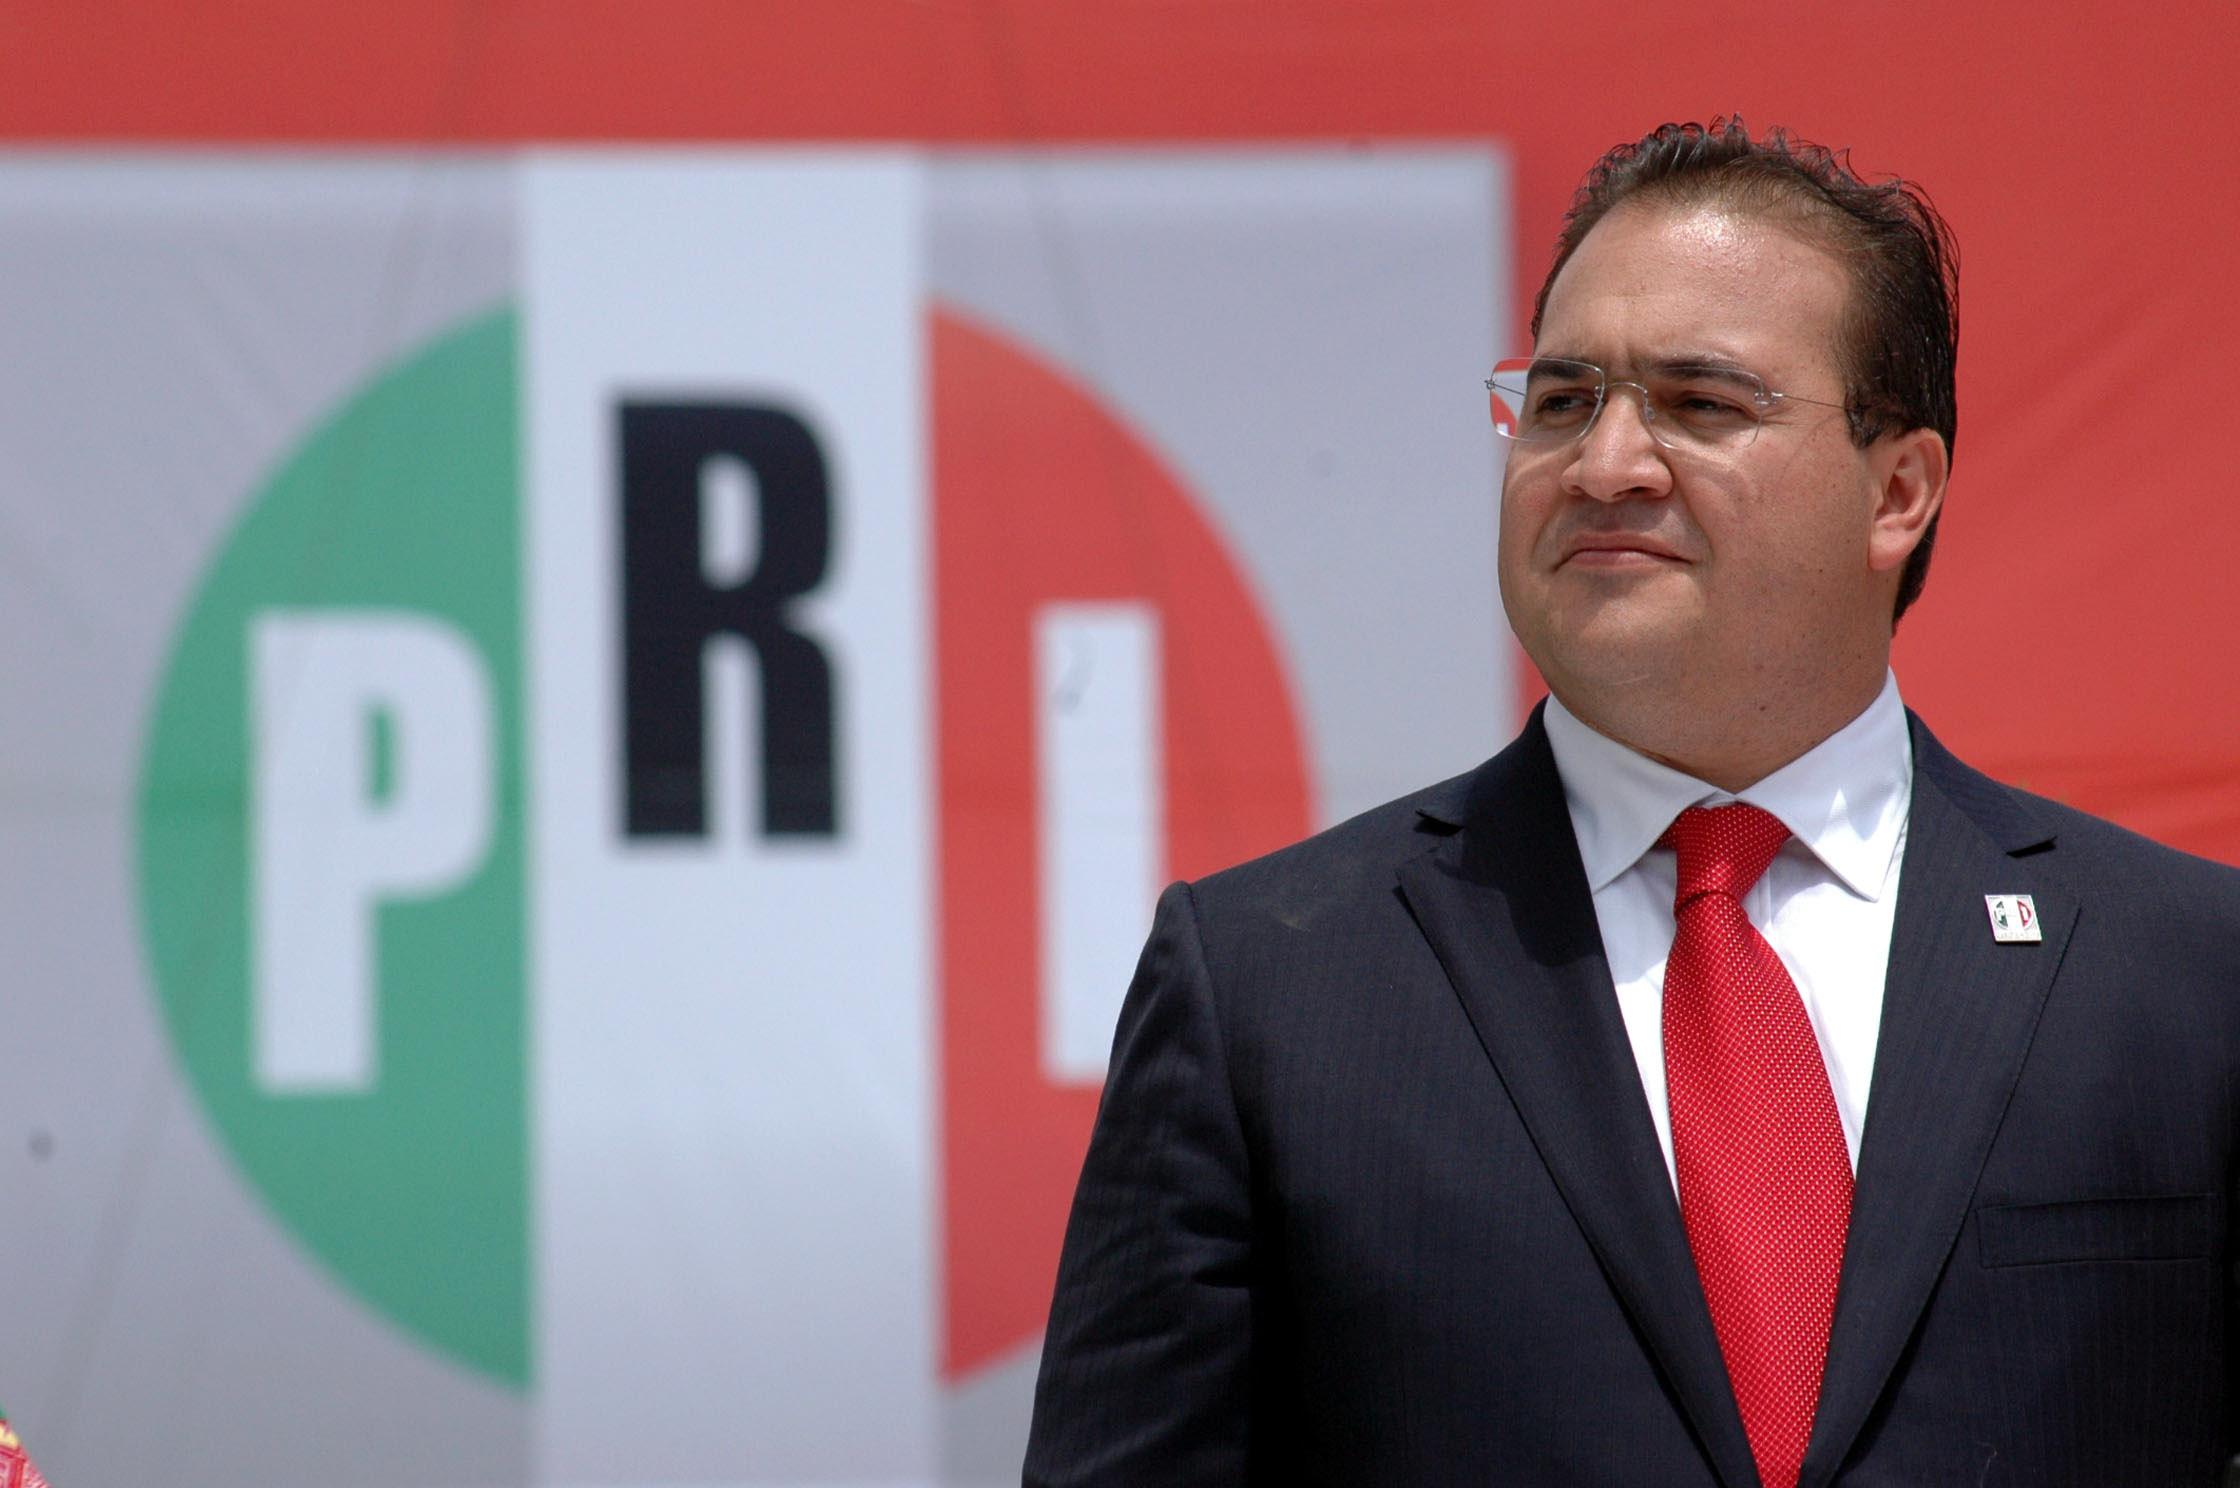 DUARTE PIDE UN COLCHÓN PARA DORMIR EN CÁRCEL DE GUATEMALA